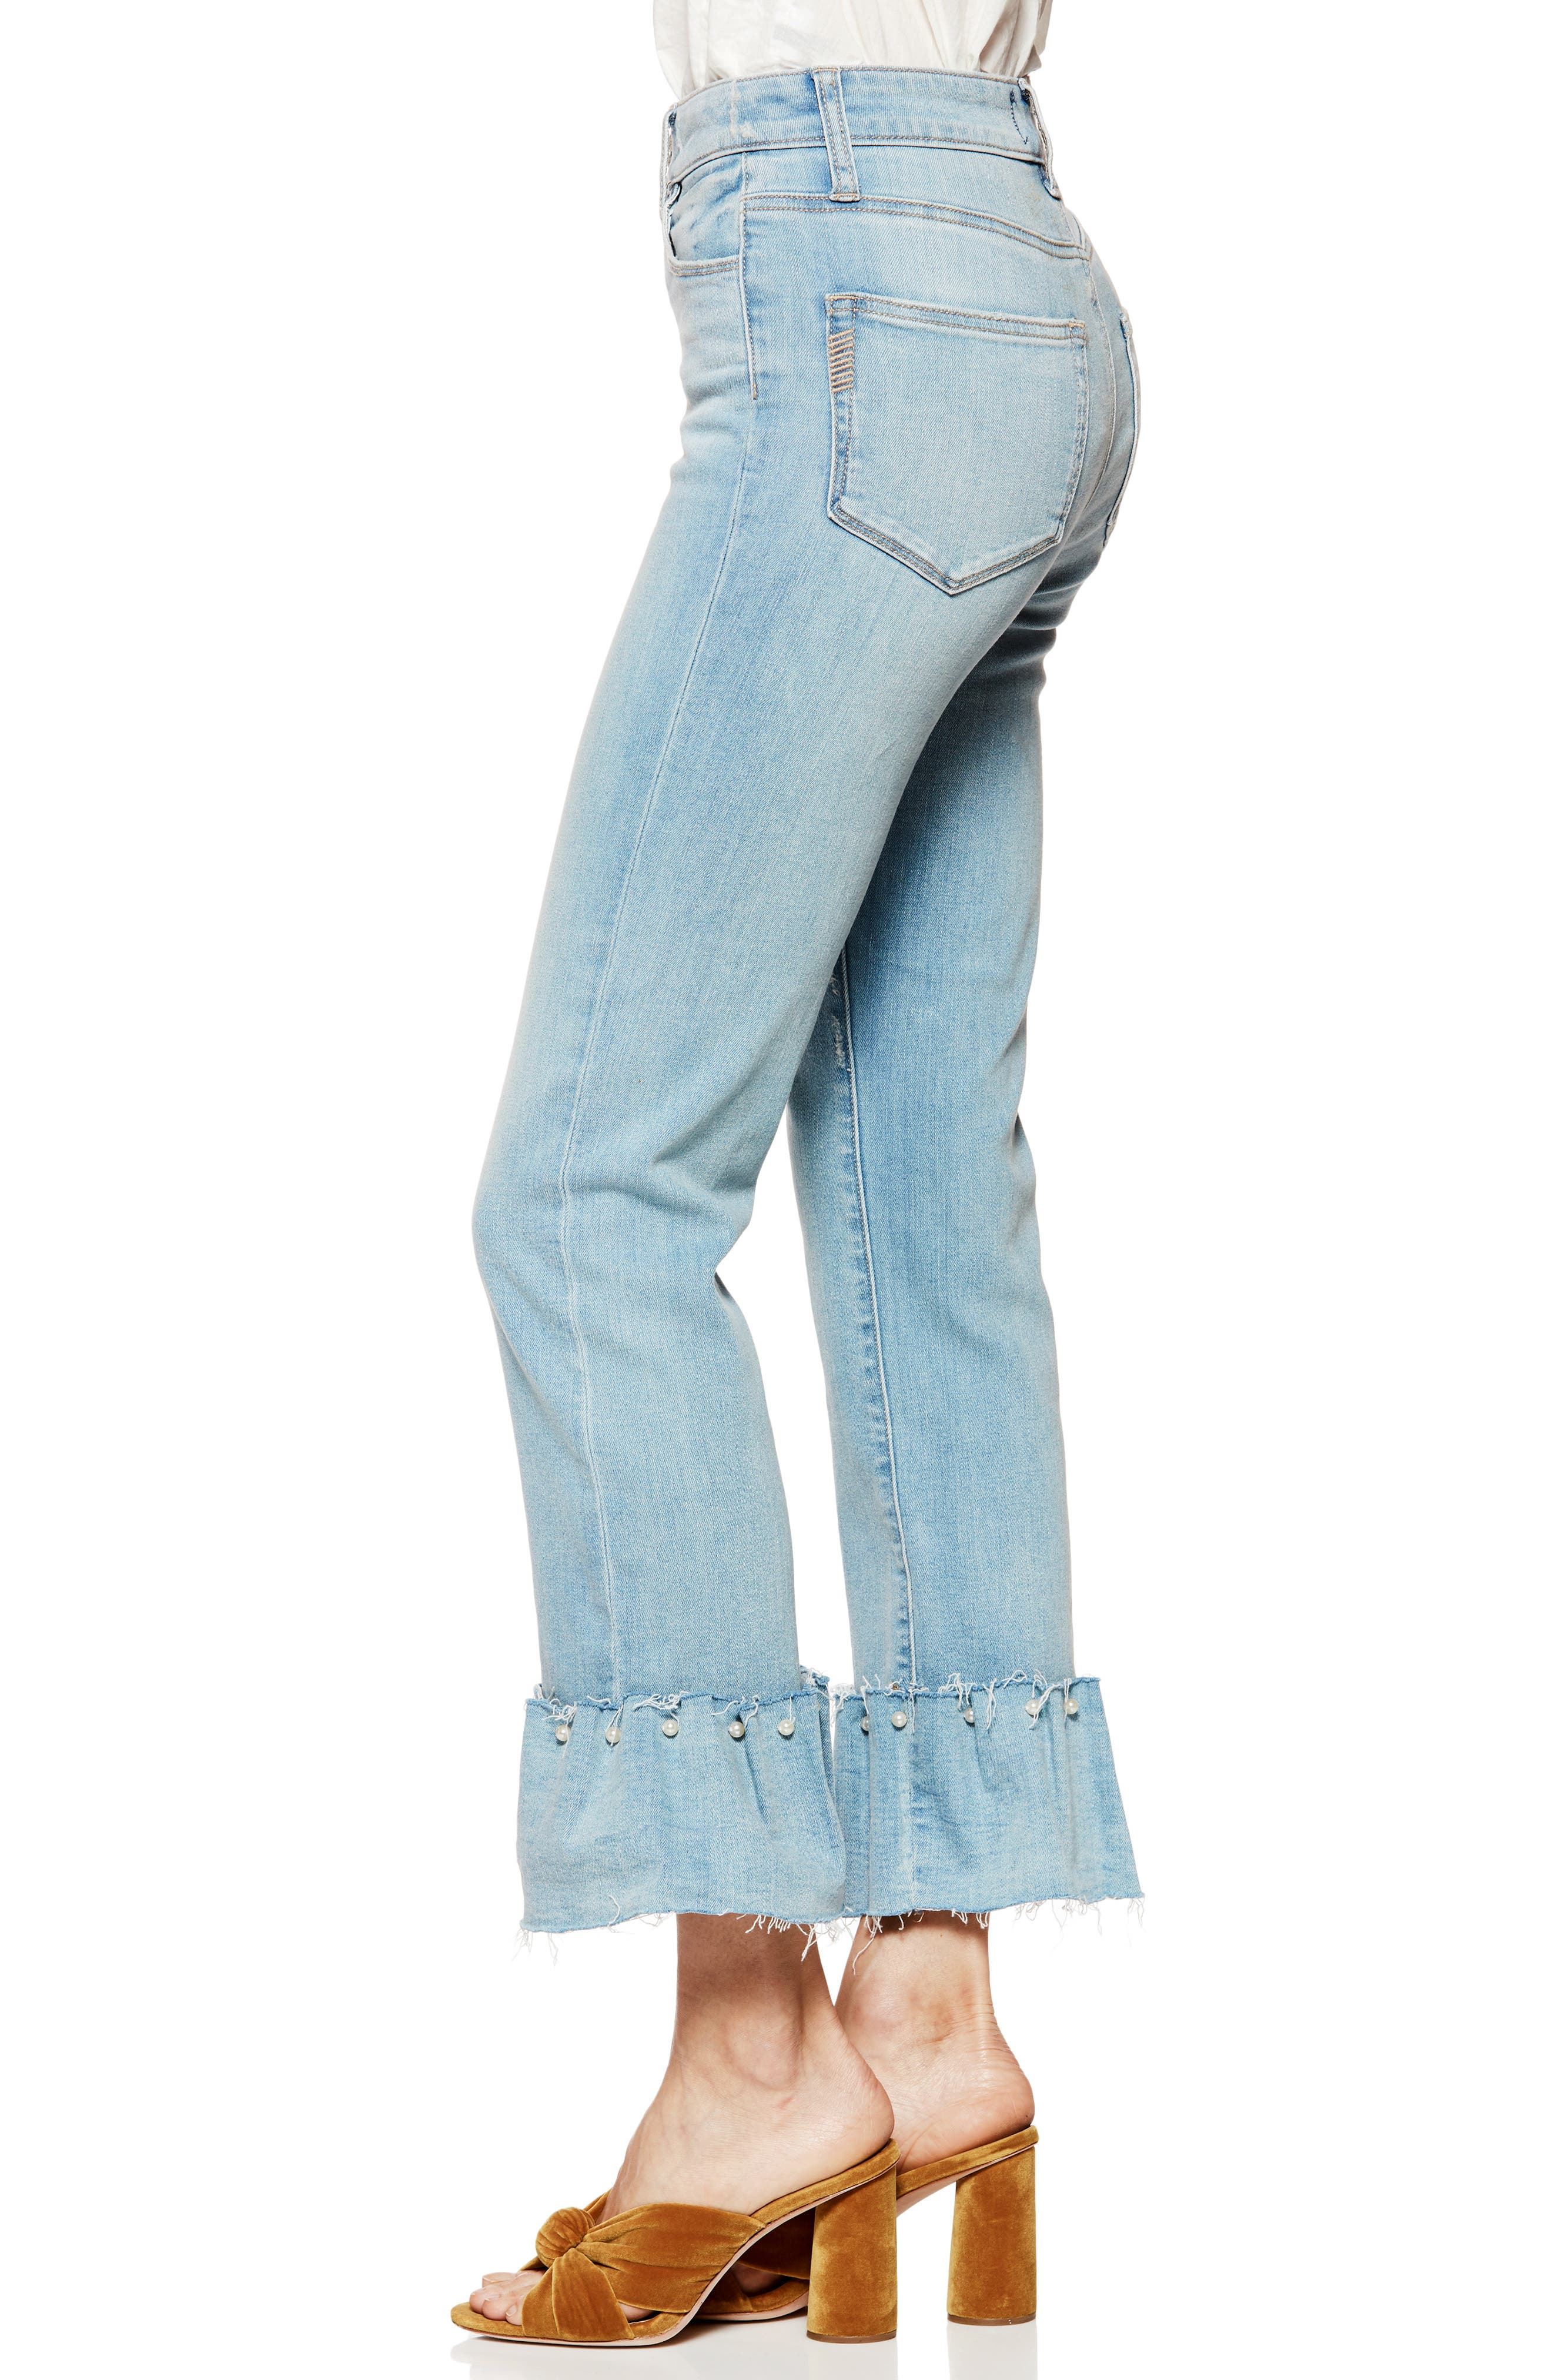 Transcend Vintage - Hoxton Embellished Ruffle High Waist Jeans,                             Alternate thumbnail 6, color,                             Palms